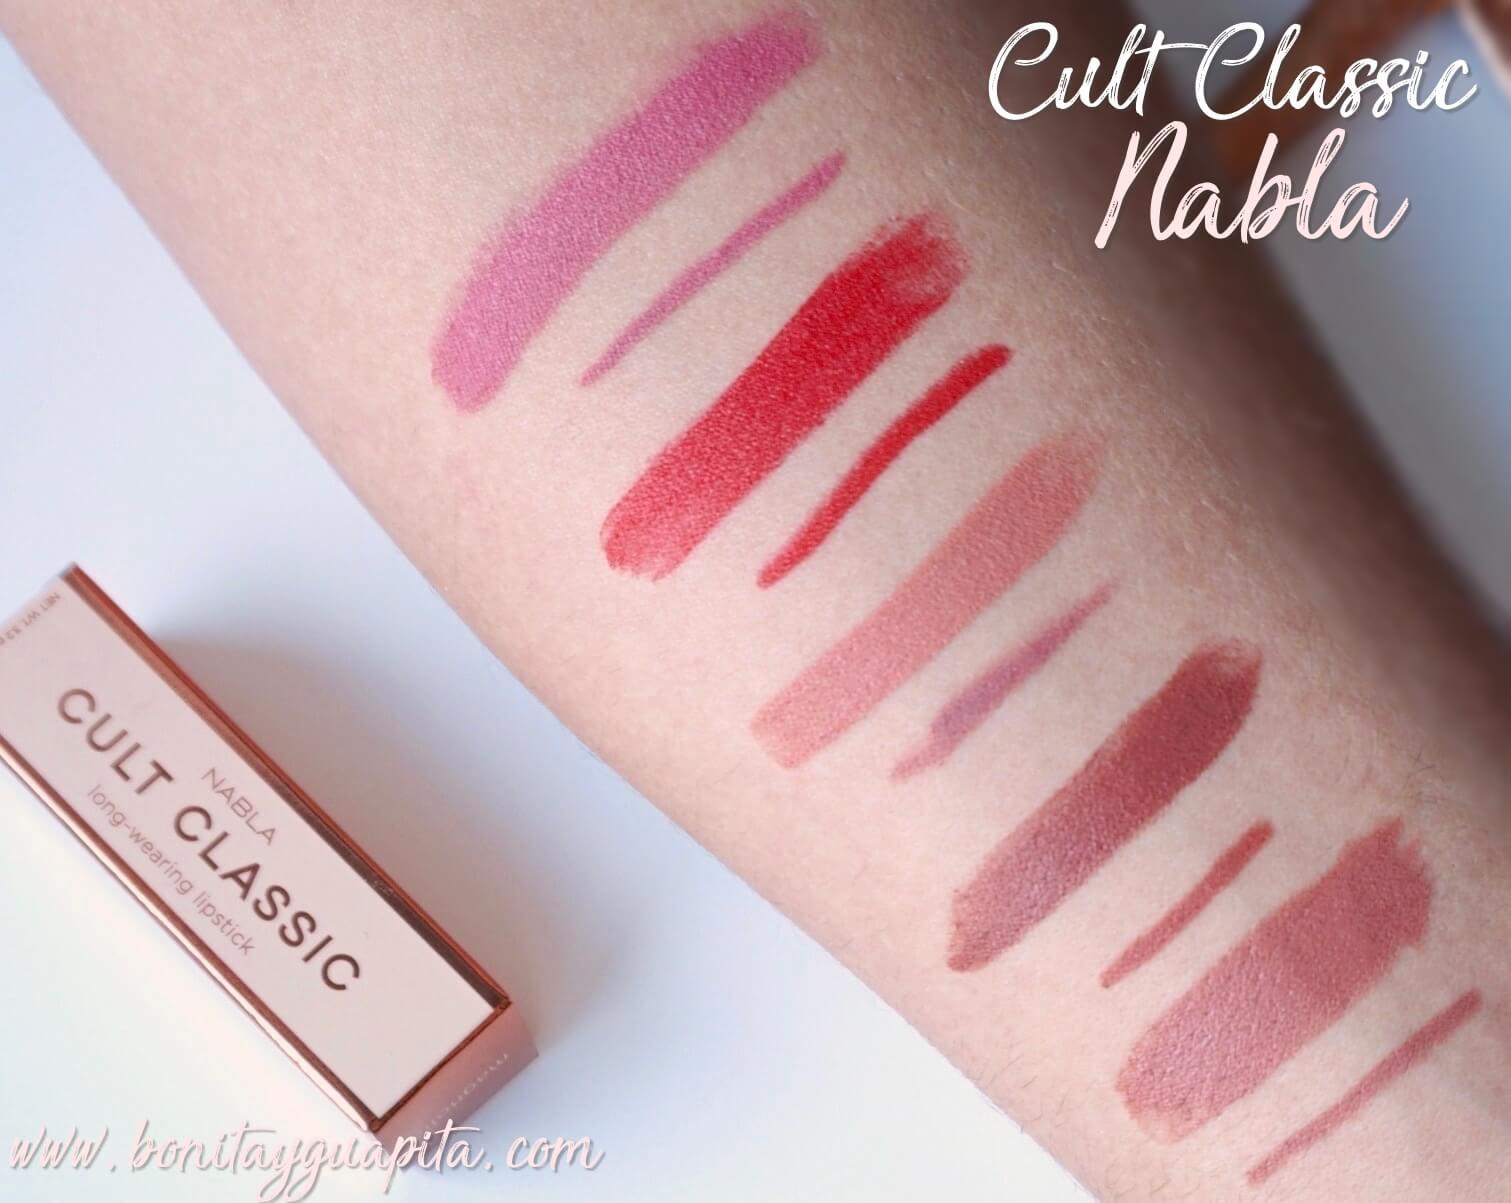 nabla cult classic swatches labiales velvetline lapiz de labios